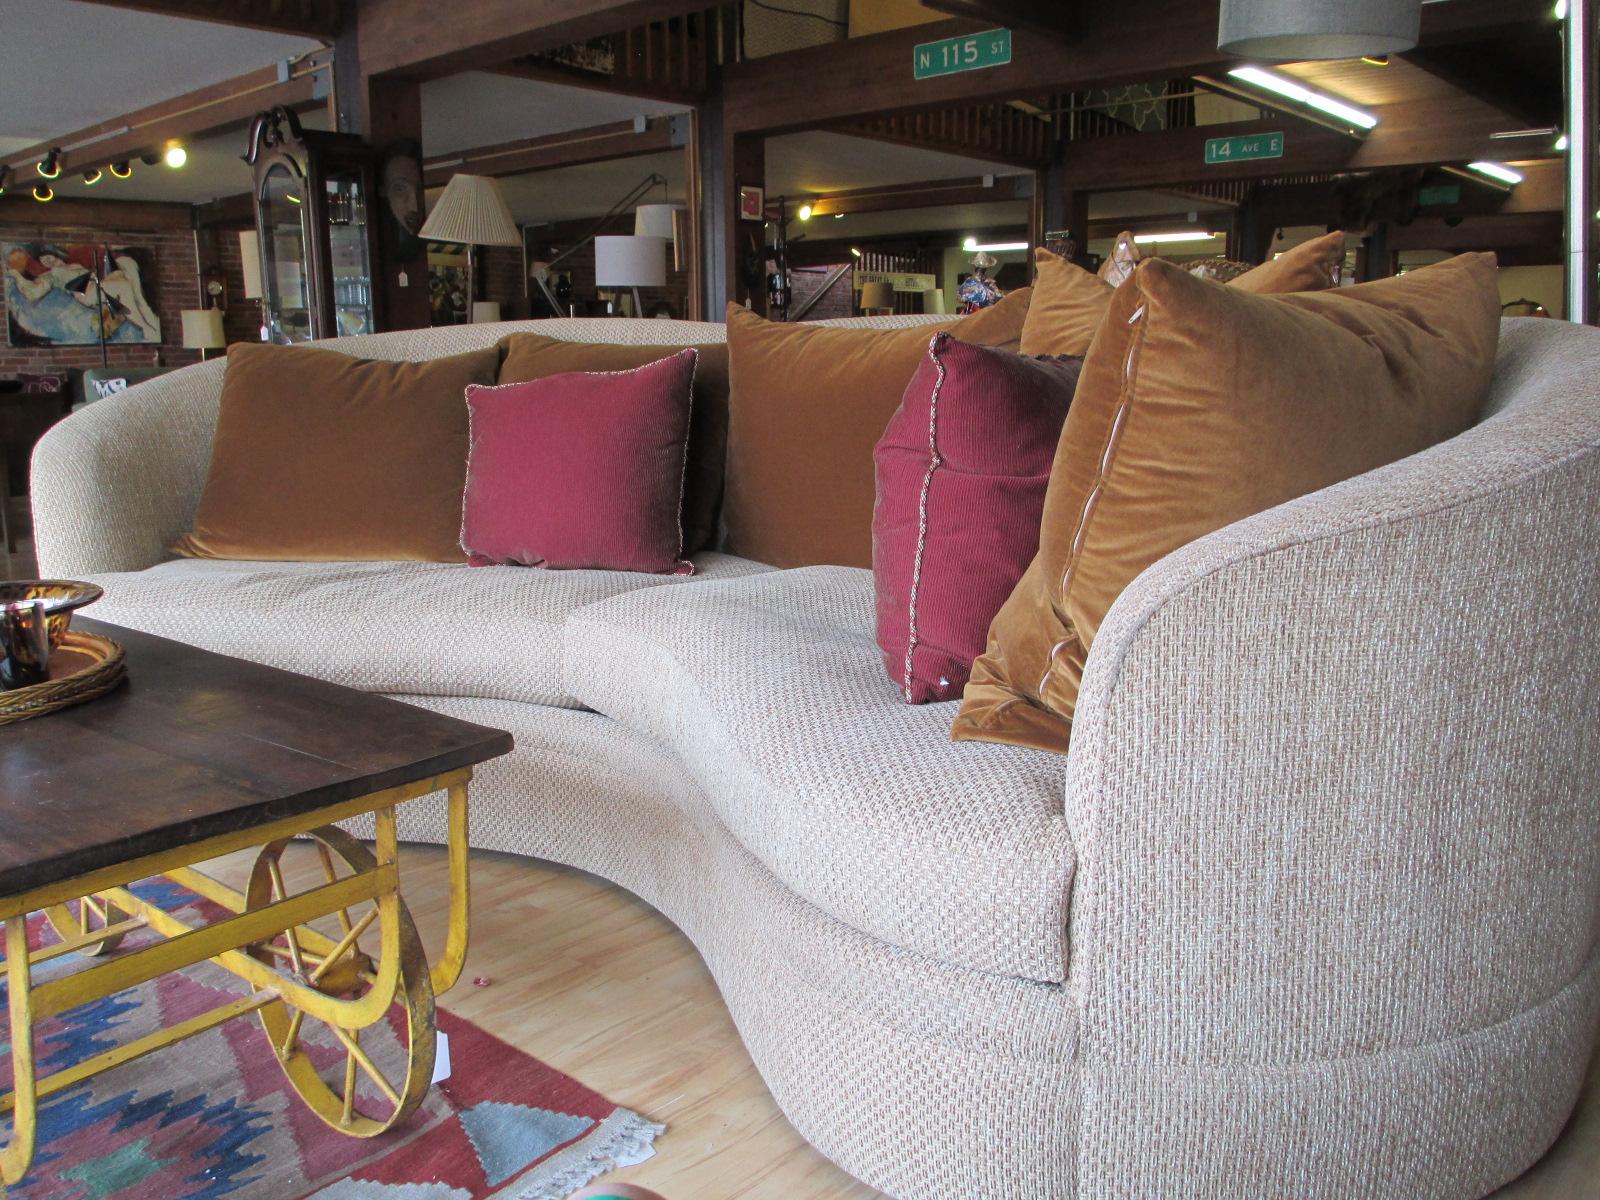 Greenbaum Kidney Shaped Sofa – SOLD